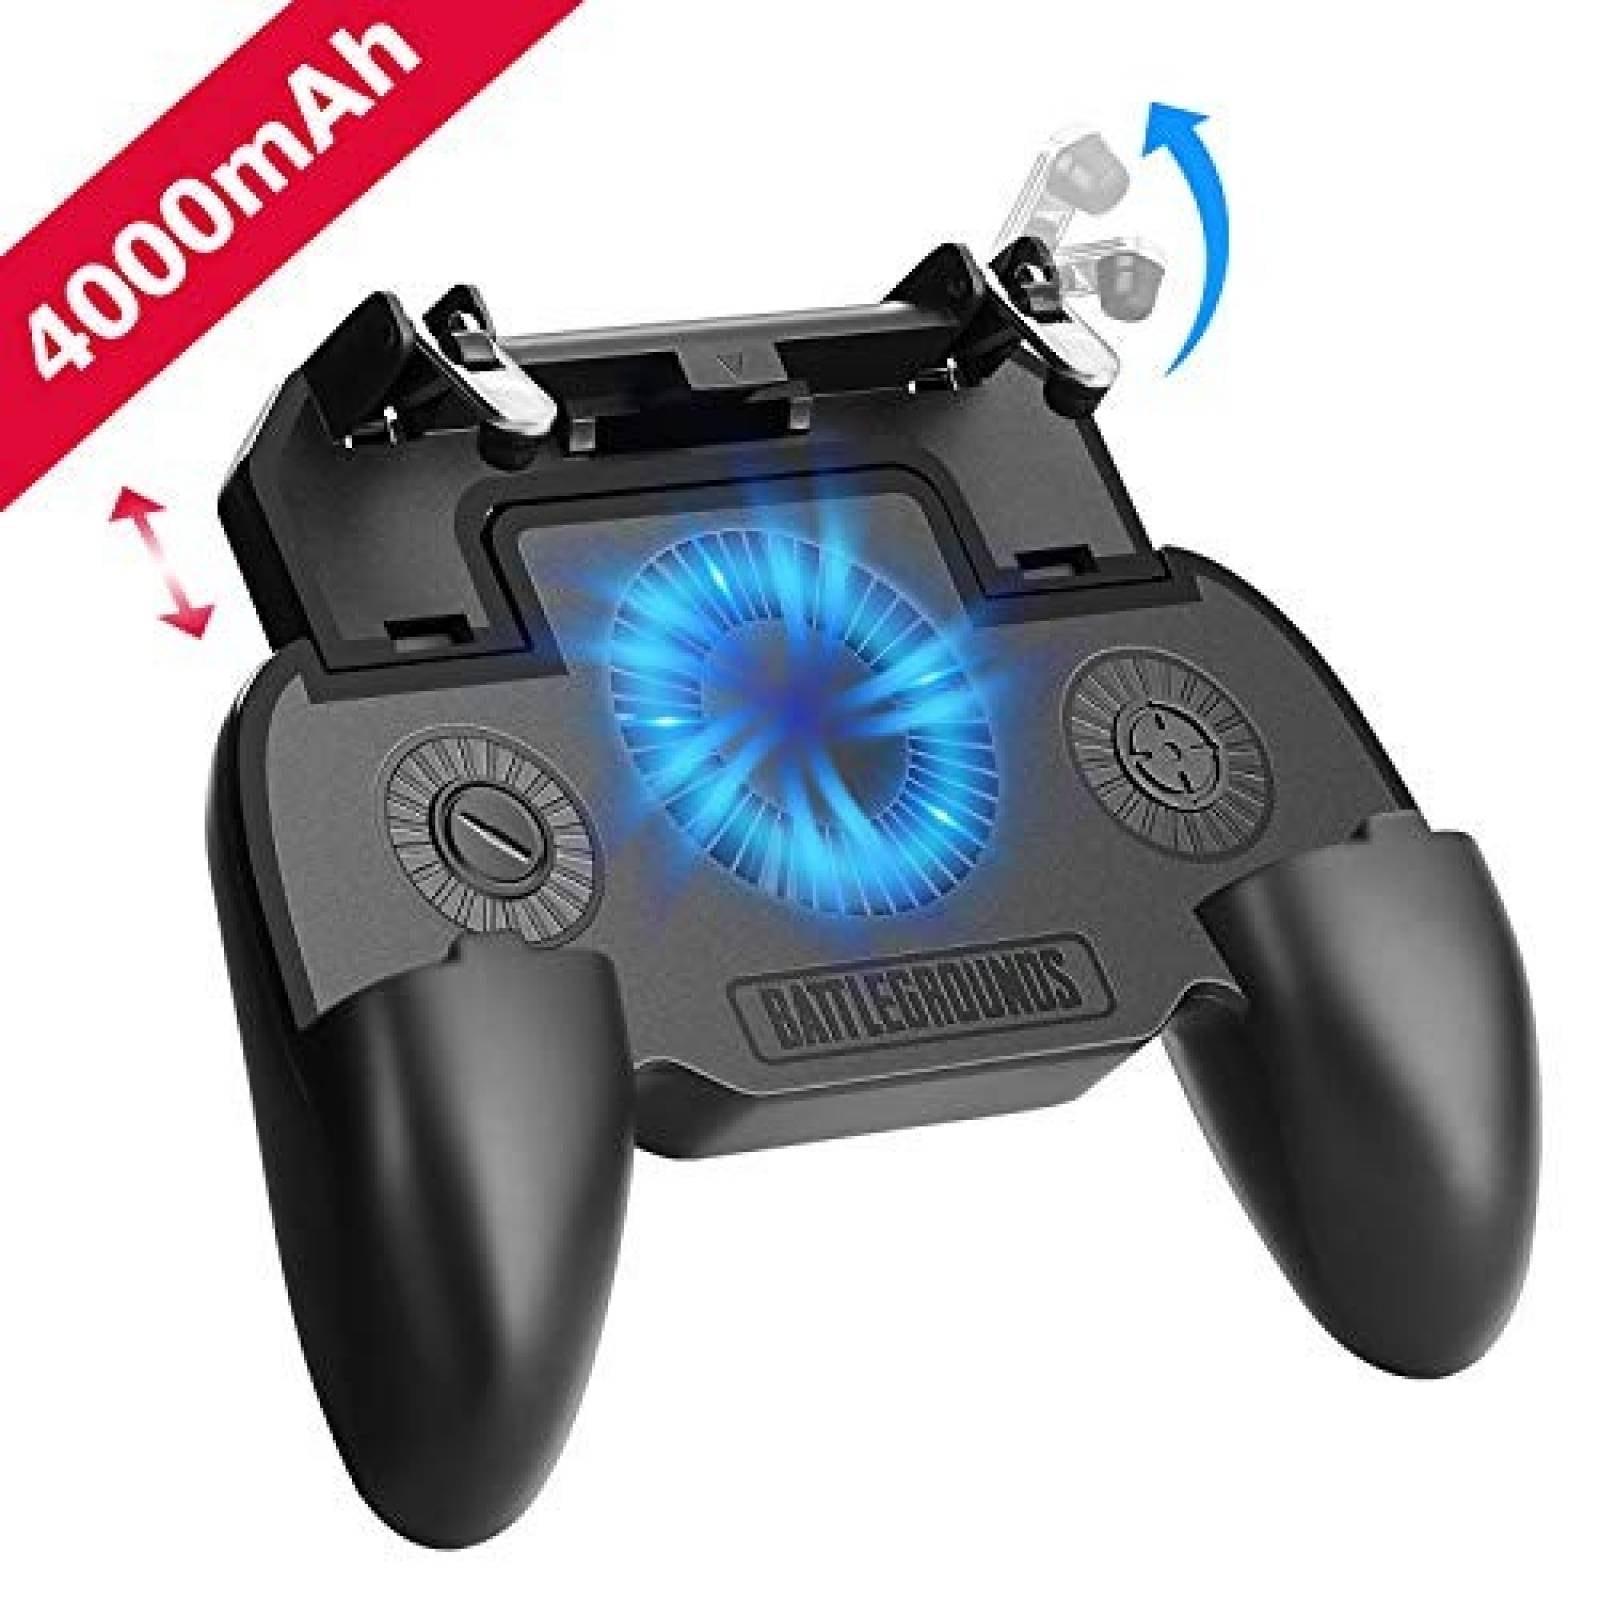 Control Gamer DELAM para smartphone bateria 4000mAh -Negro